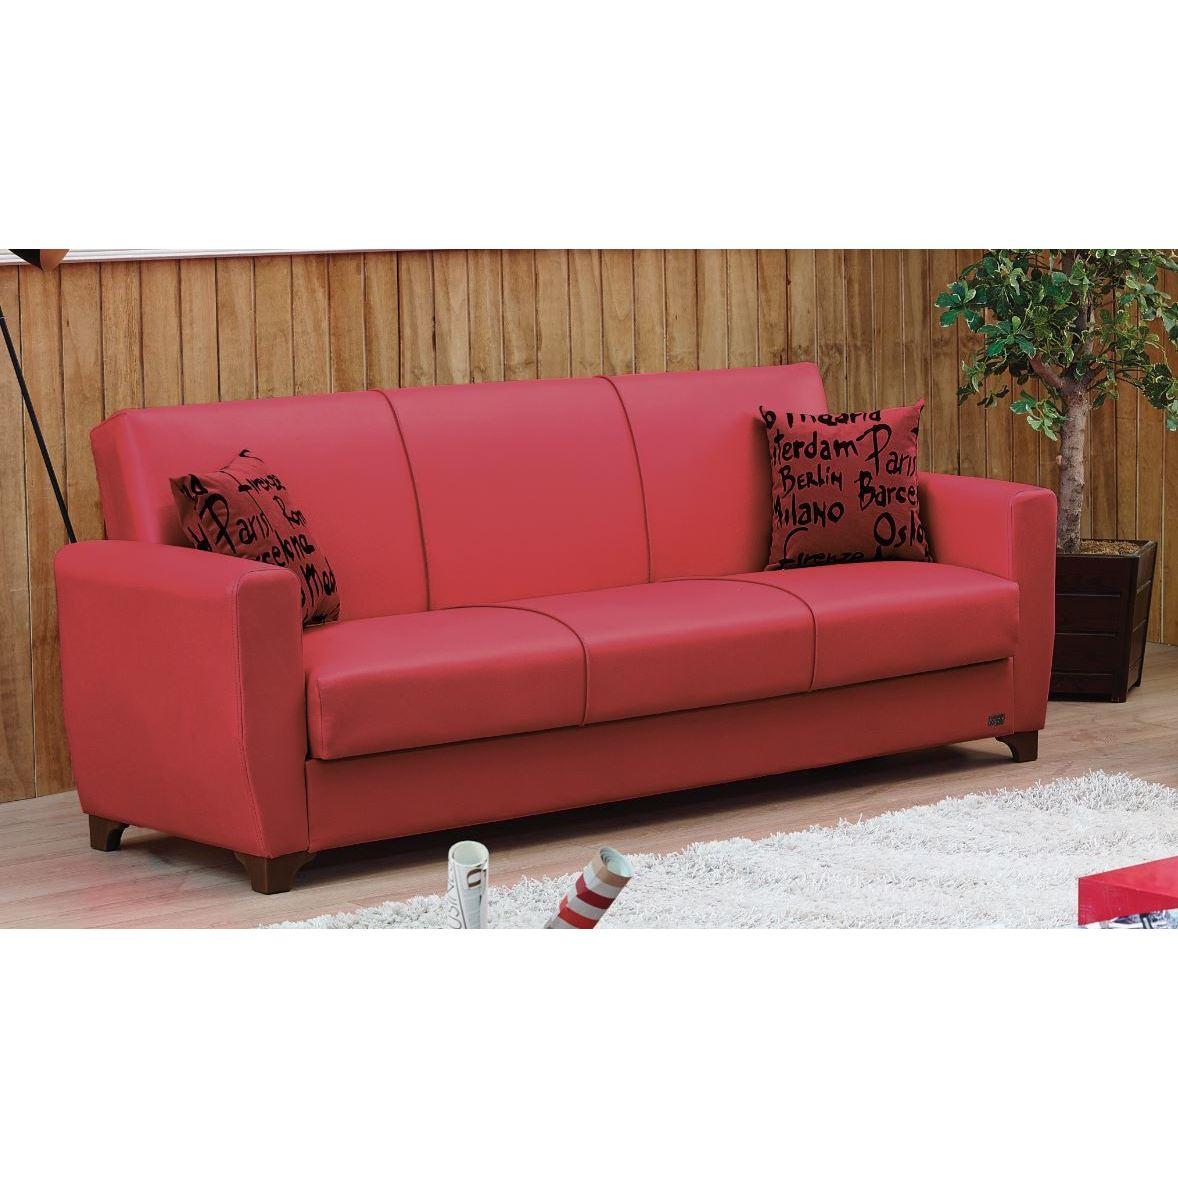 Dallas Red Convertible Sofa Bed